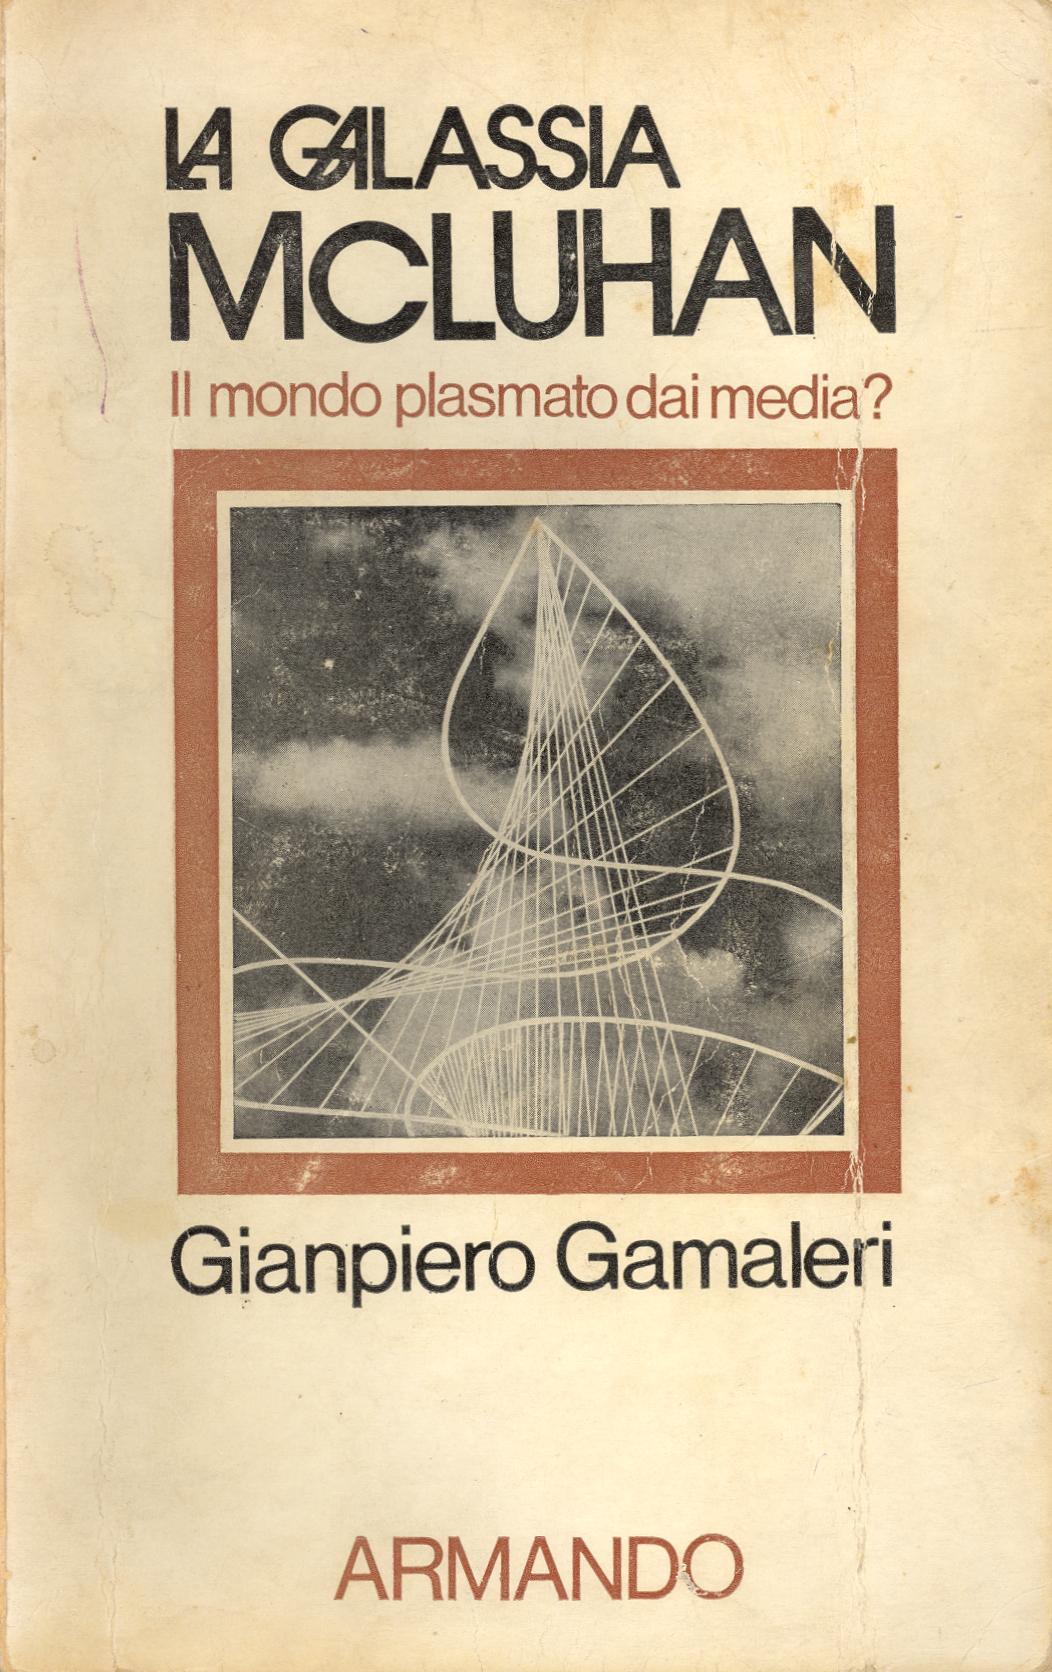 La galassia McLuhan